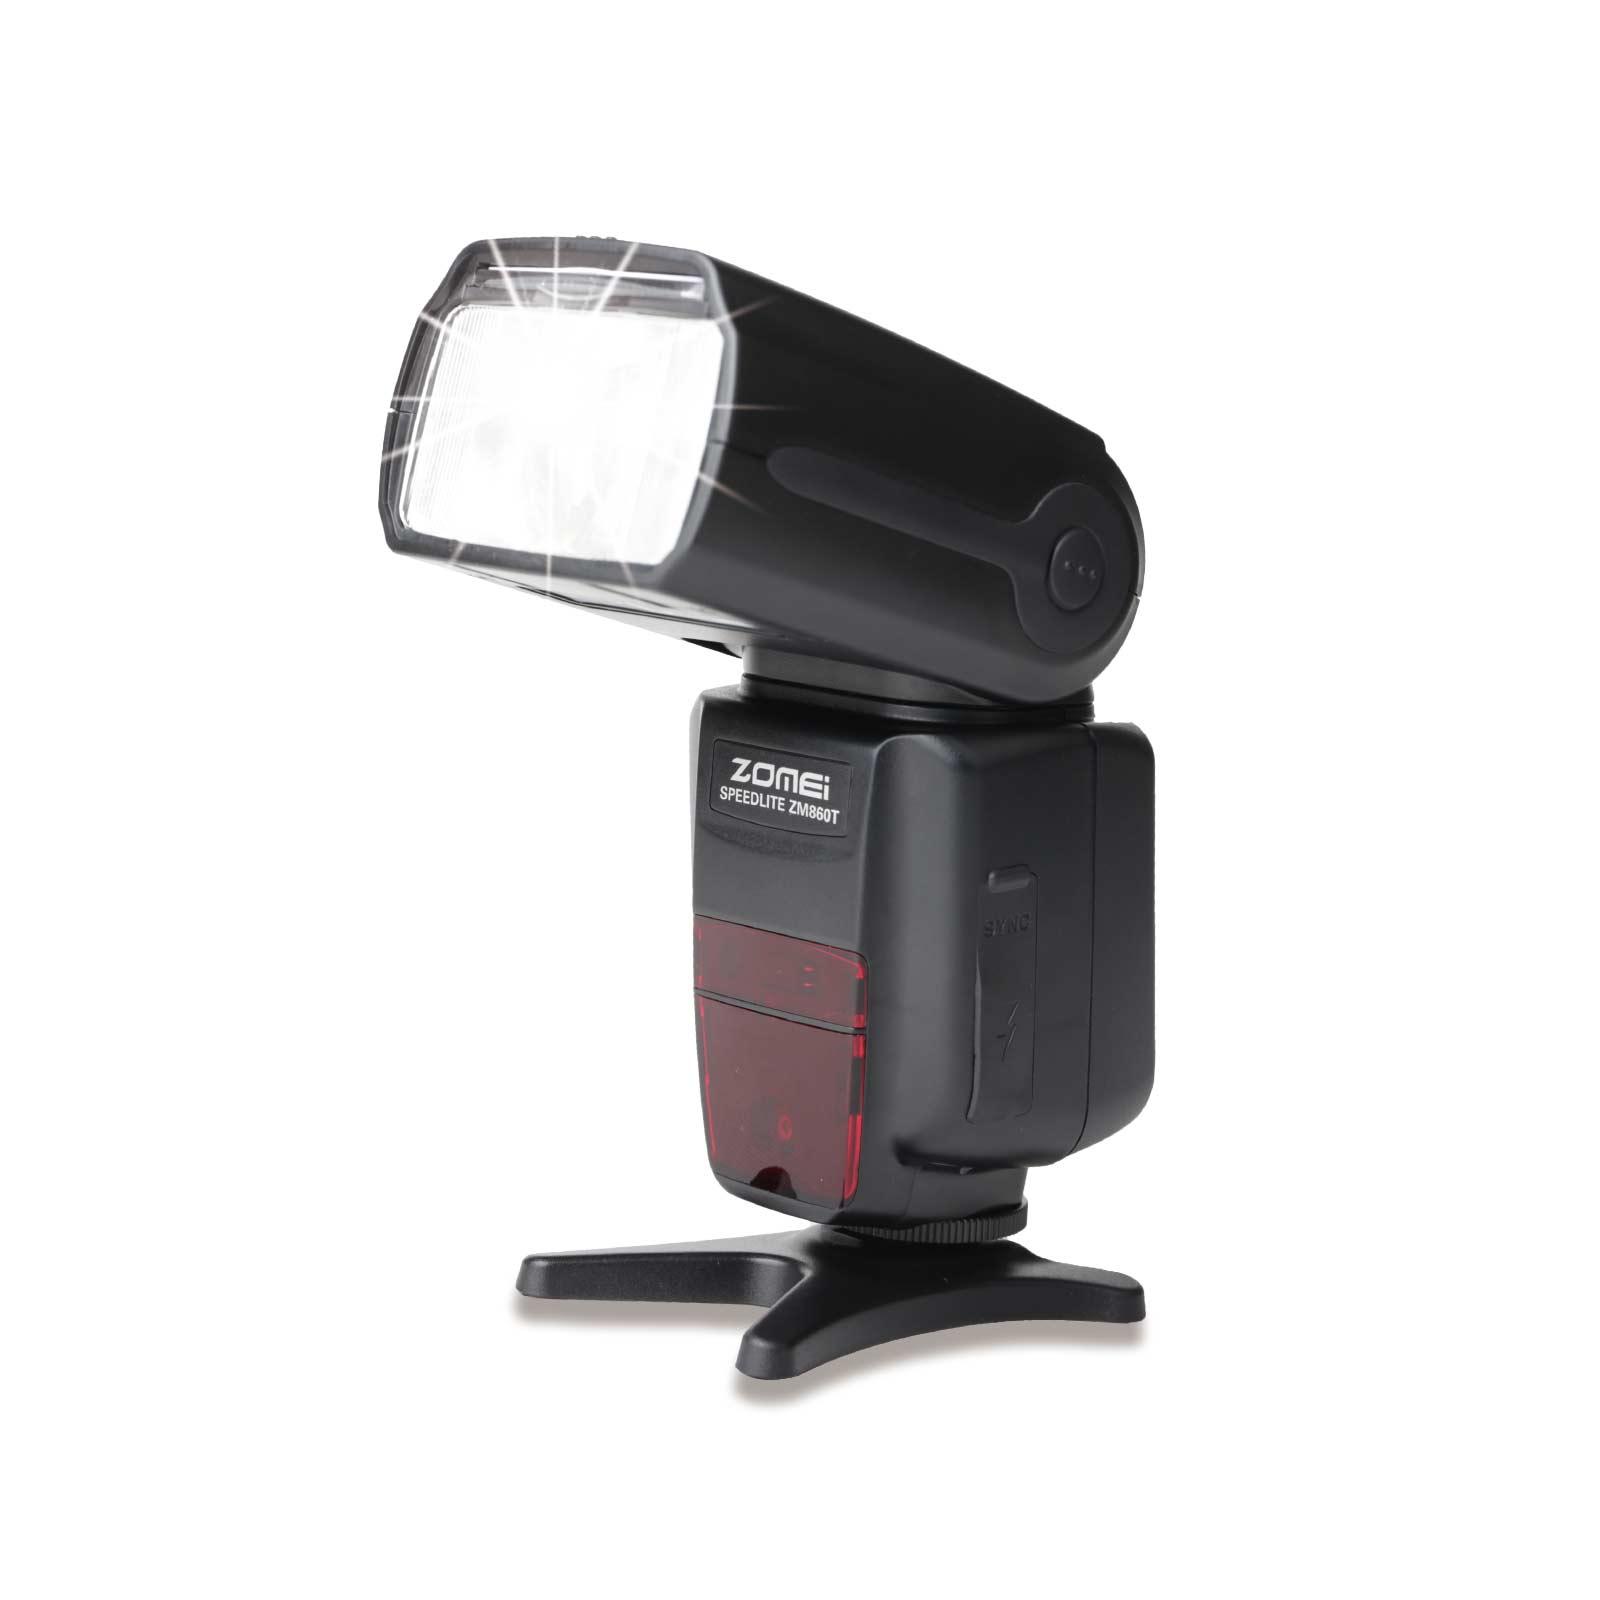 F16772 Zomei ZM860T LCD Display TTL High Speed Speedlite Speedlight Flash Light for DSLR Digital Camera 700D 60D 70D D7100 zomei zm860t lcd display high speed ttl speedlite speedlight flash for canon 5d2 5d3 7d 700d nikon d7500 d7300 d5300 dslr camera